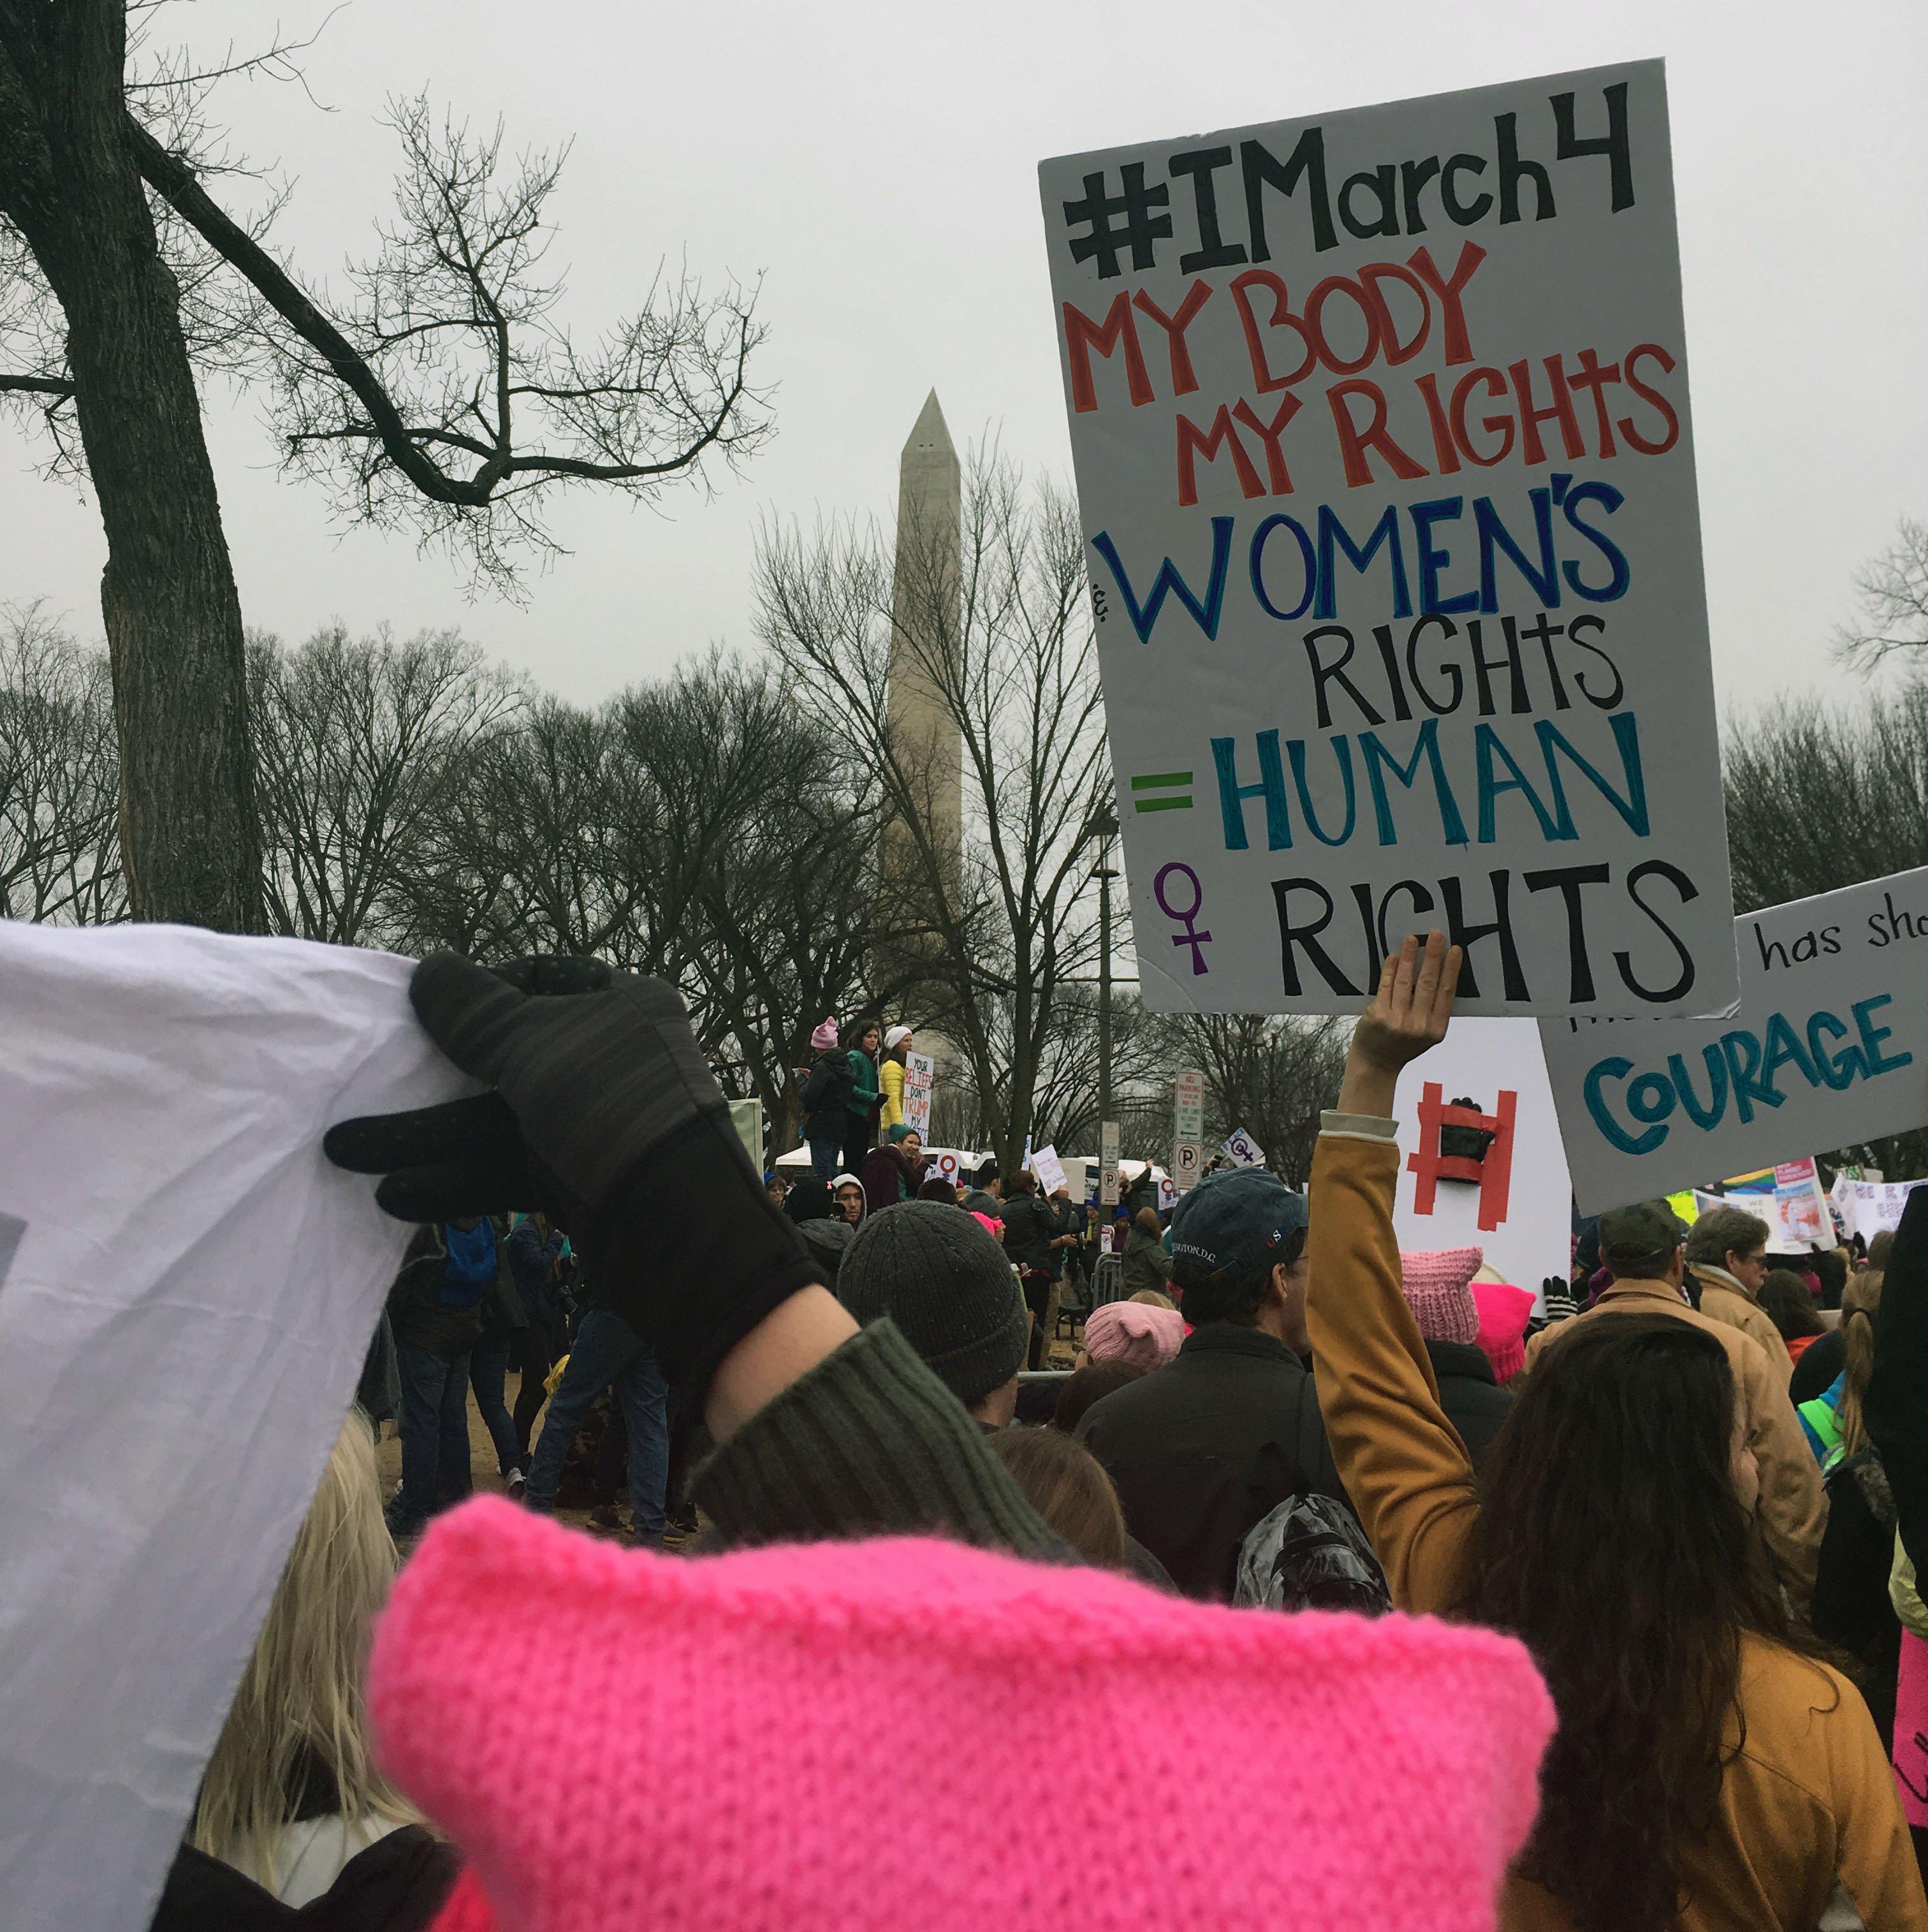 dc_march_signs_meghan_werft.jpg